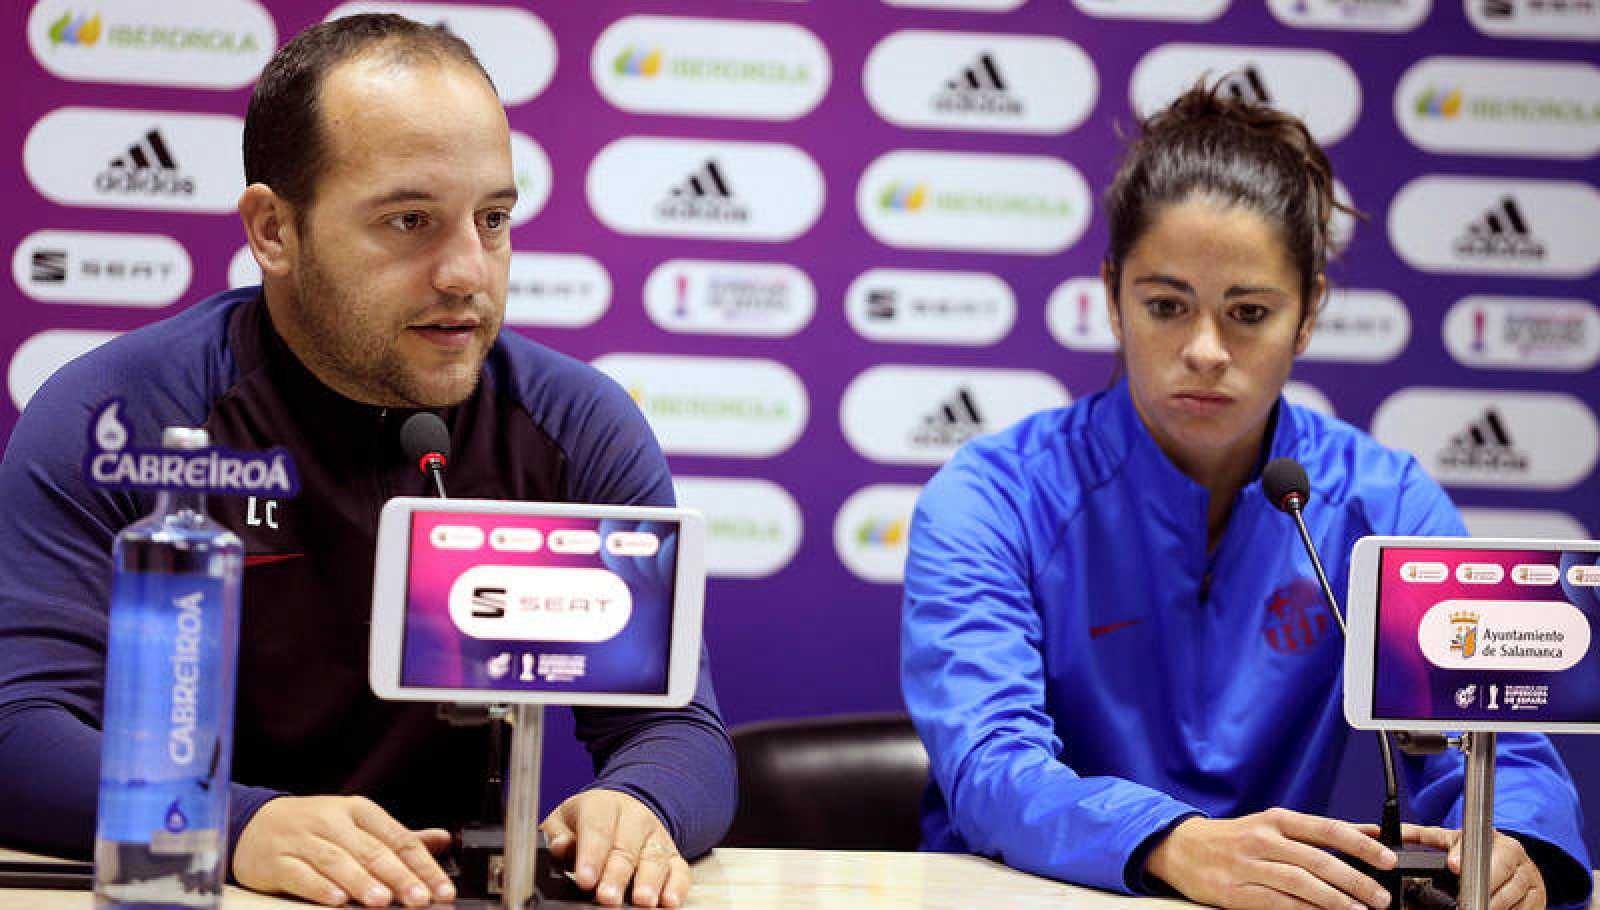 El entrenador del Barcelona femenino, Lluis Cortés, y la capitana del equipo Marta Torrejón.